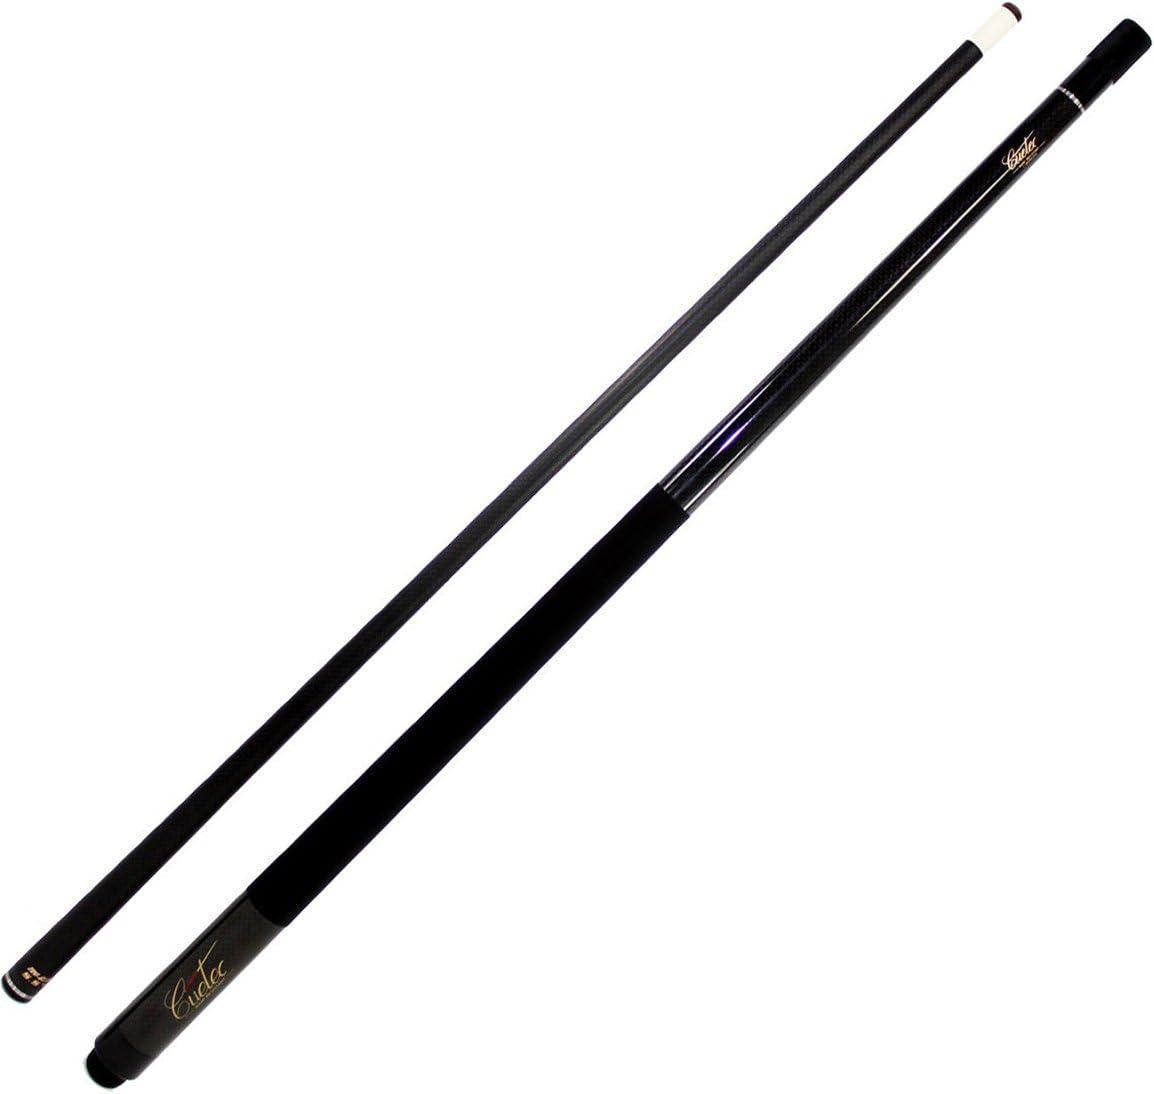 "Cuetec Graphite Series 58"" 2-Piece Composite Billiard Pool Cue"